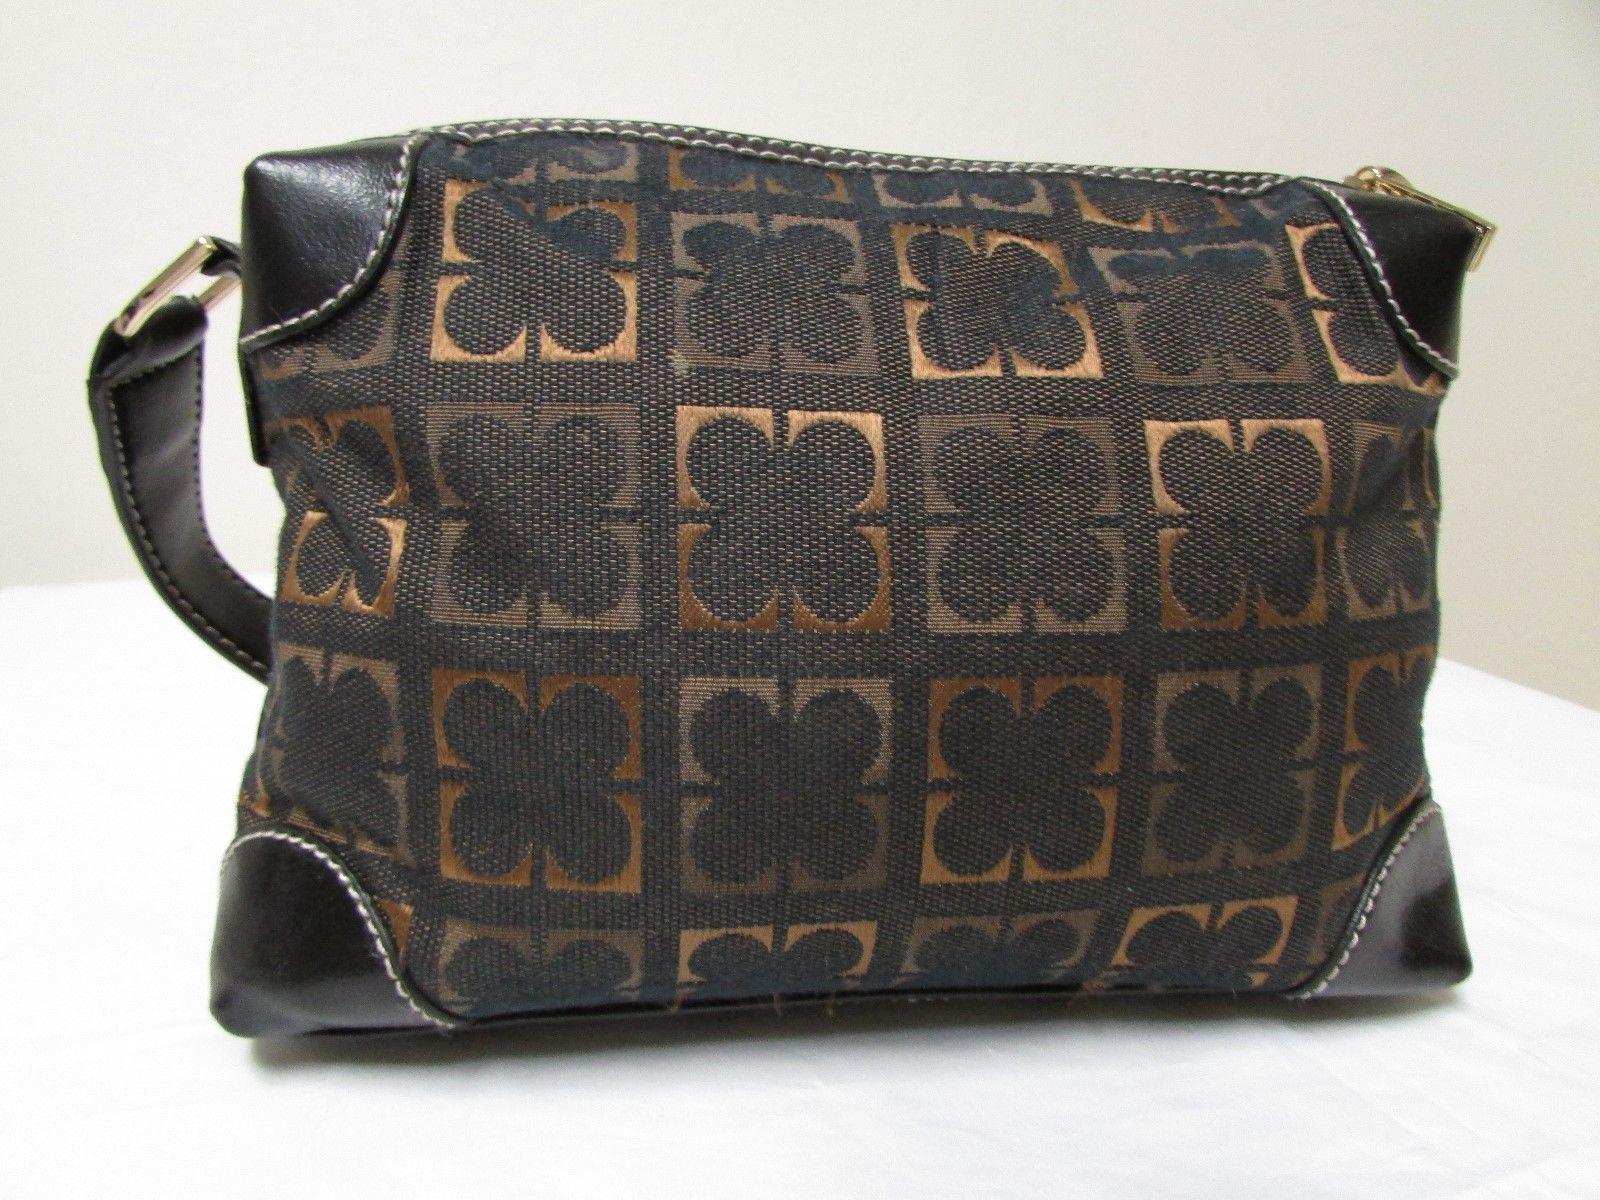 Vintage Liz Claiborne Black With Brown And Gold Fabric Shoulder Handbag Sz S image 3